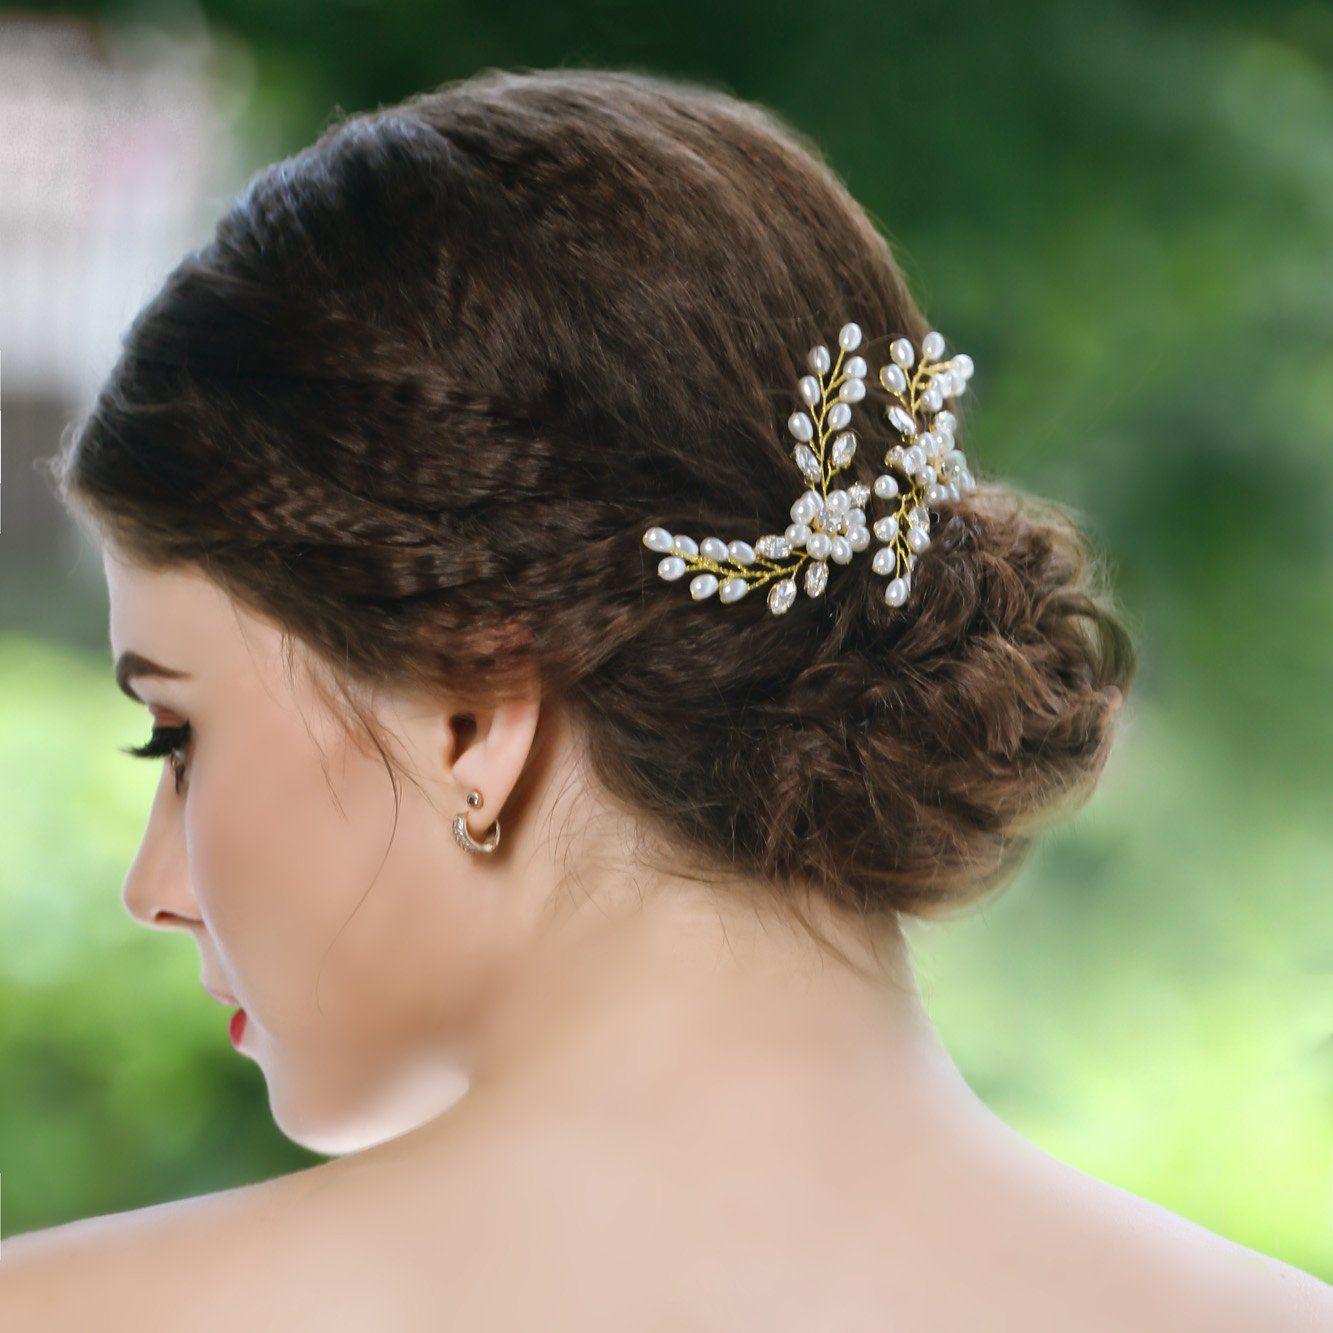 unicra wedding hair pins hair set jewelry decorative bridal